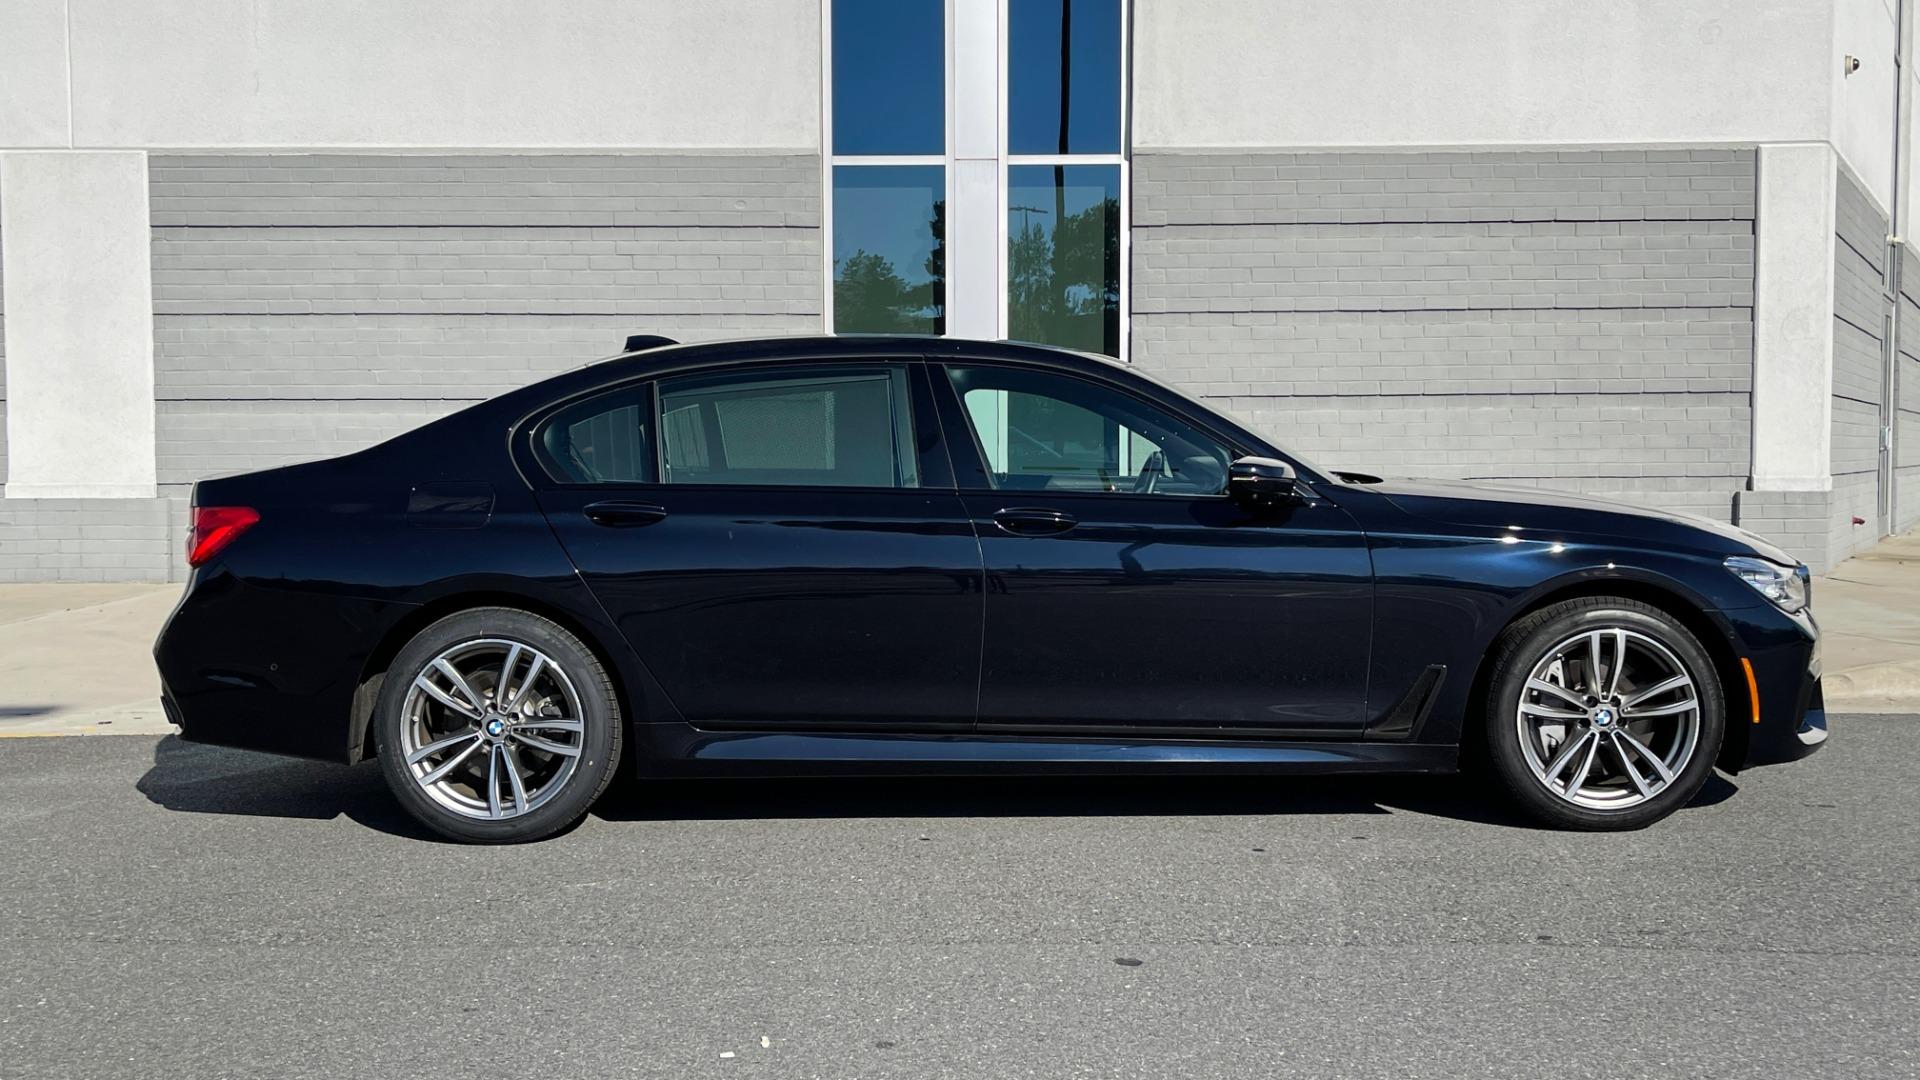 Used 2019 BMW 7 SERIES 750I XDRIVE M-SPORT / EXEC PKG / DRVR ASST PLUS / CLD WTHR / PAR for sale $60,995 at Formula Imports in Charlotte NC 28227 7